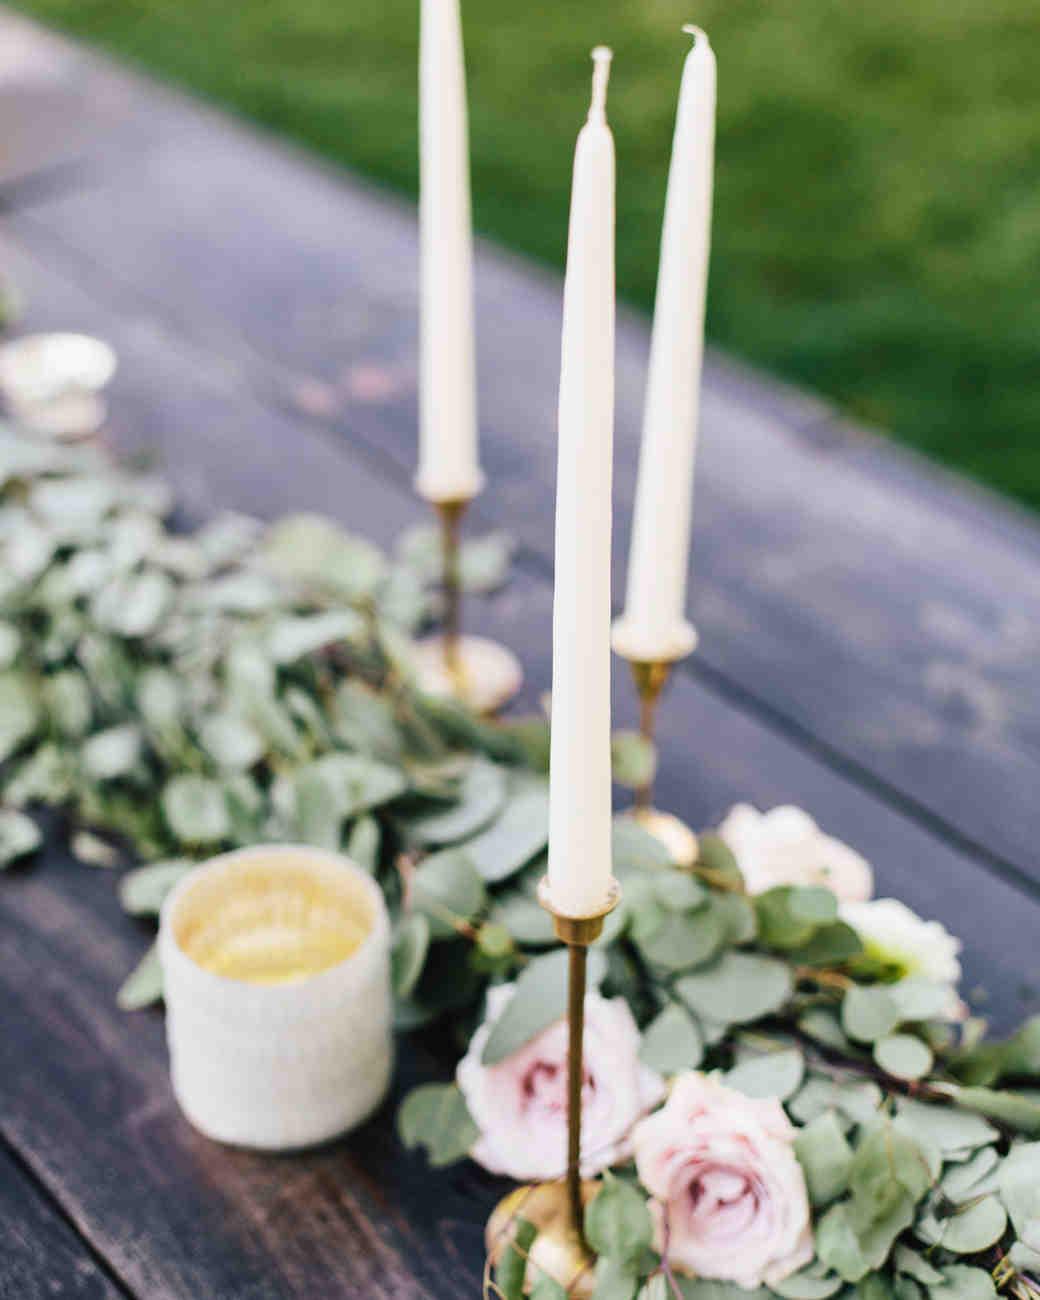 mackenzie-boman-wedding-centerpiece-192-s112693-0316.jpg